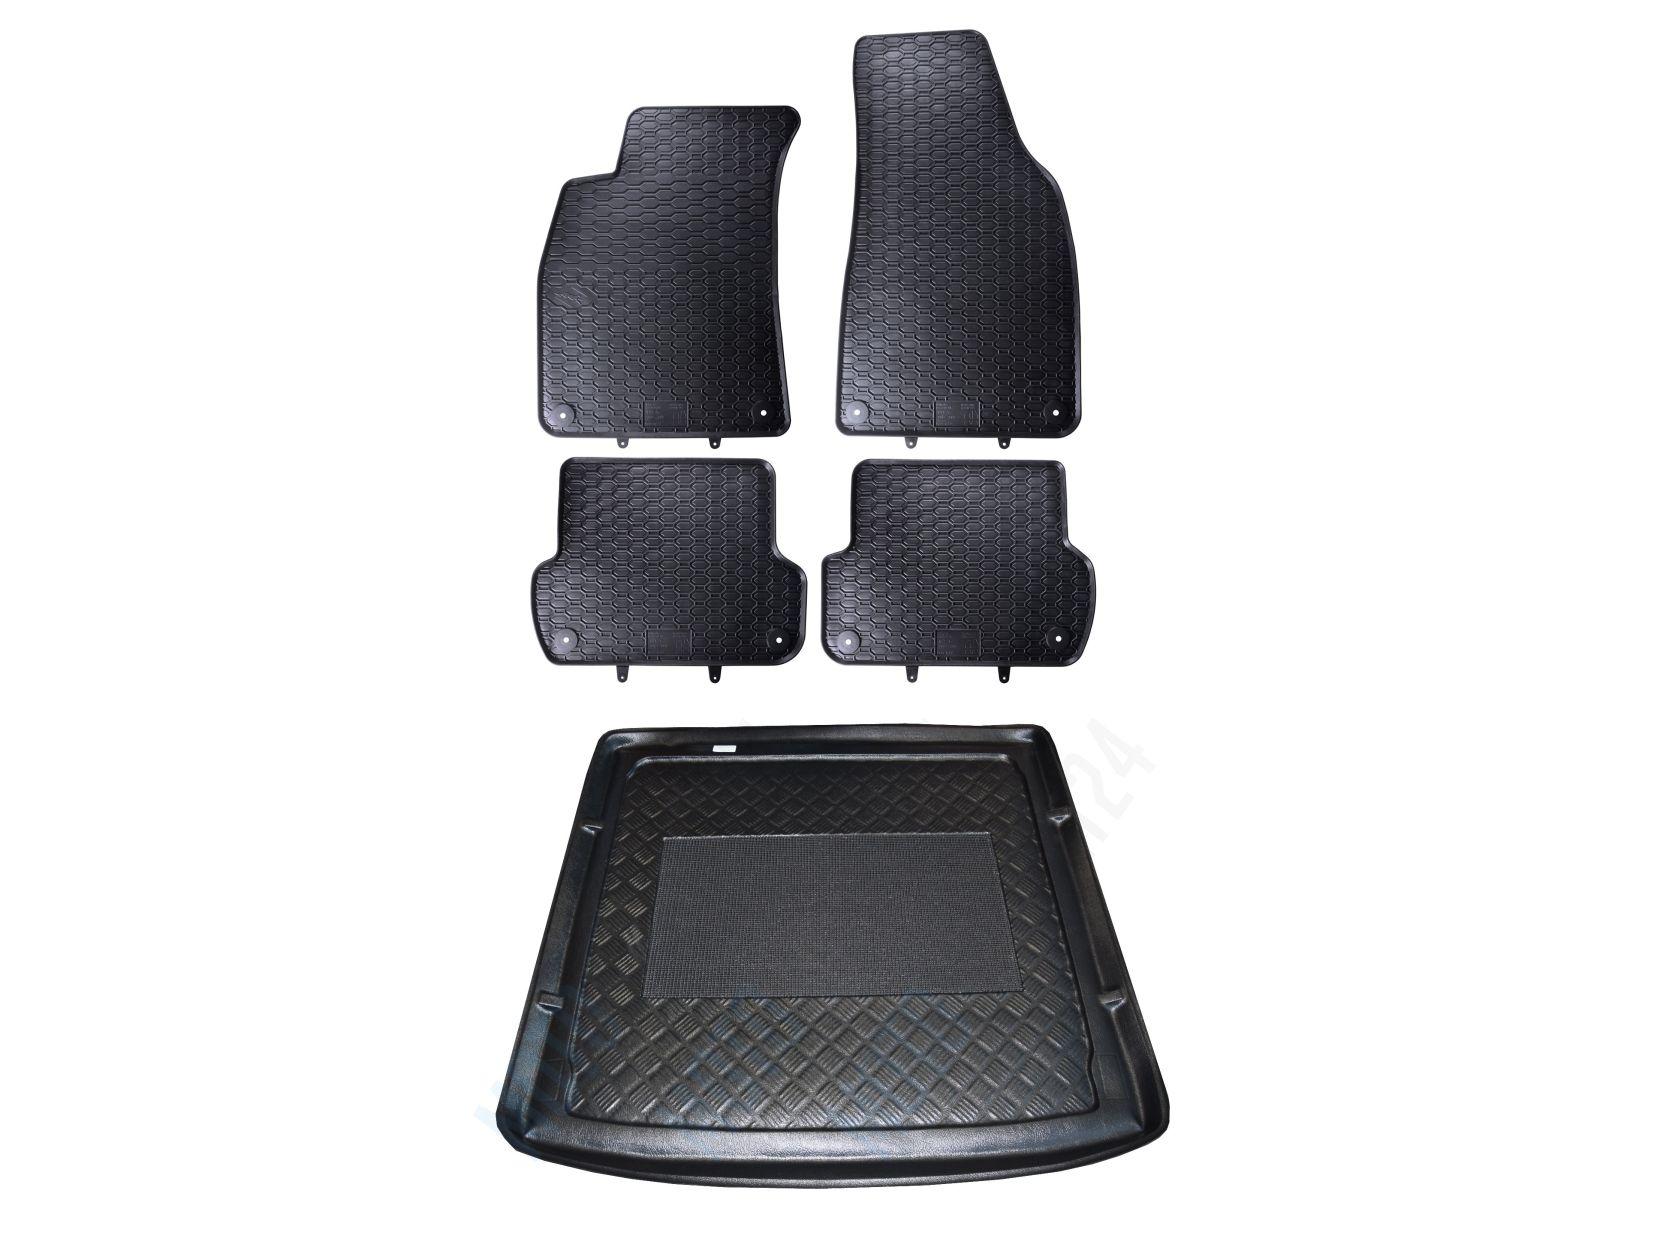 Dywaniki Mata Bagażnika Do Audi A4 B6 B7 Kombi Kpl Na Bazarekpl